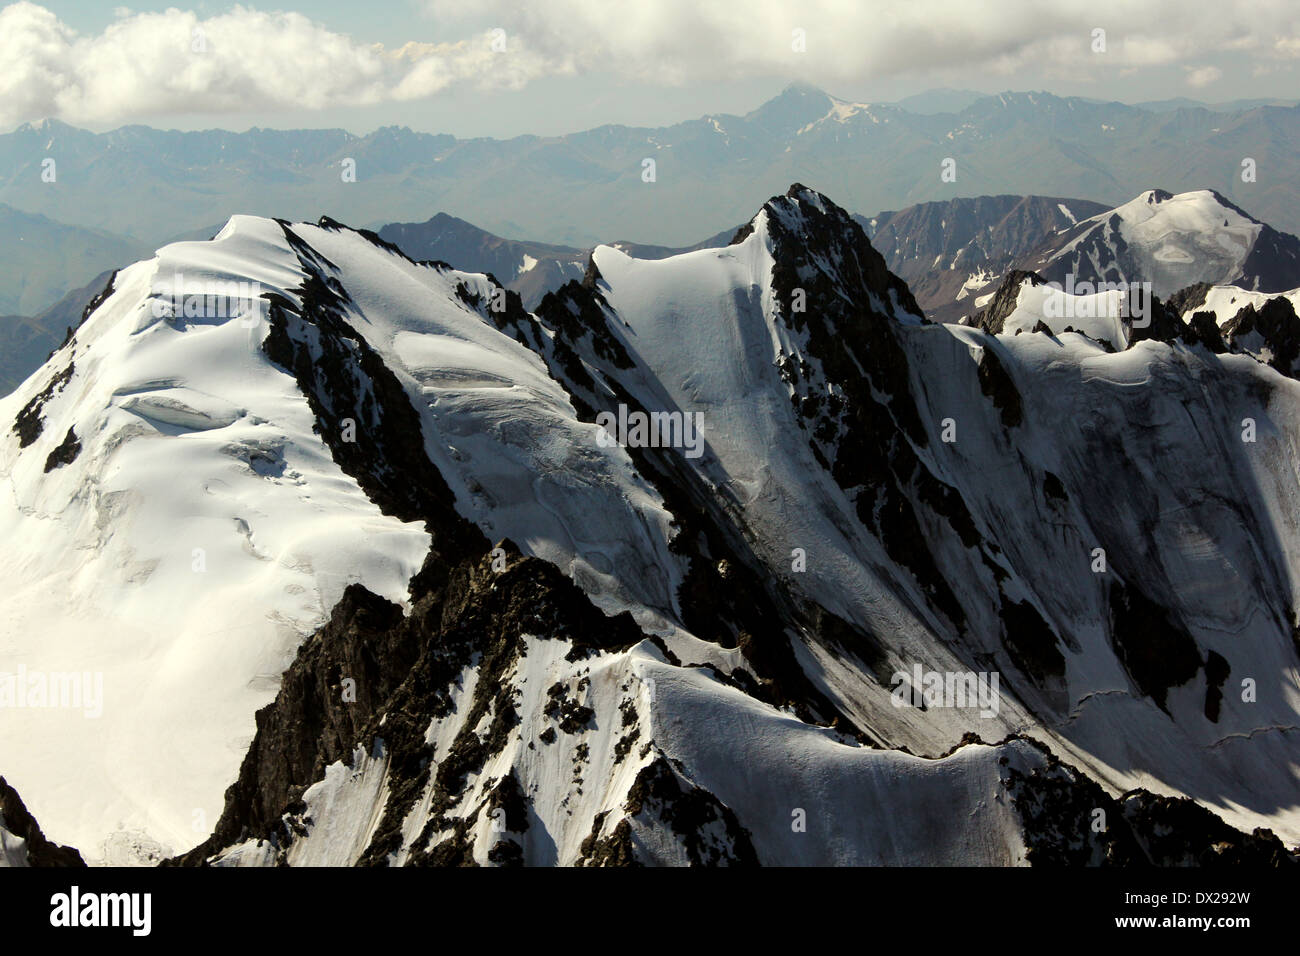 Hanging glaciers in Ala-Archa National Park, Kyrgyz range, Tien-Shan. Kyrgyzstan - Stock Image